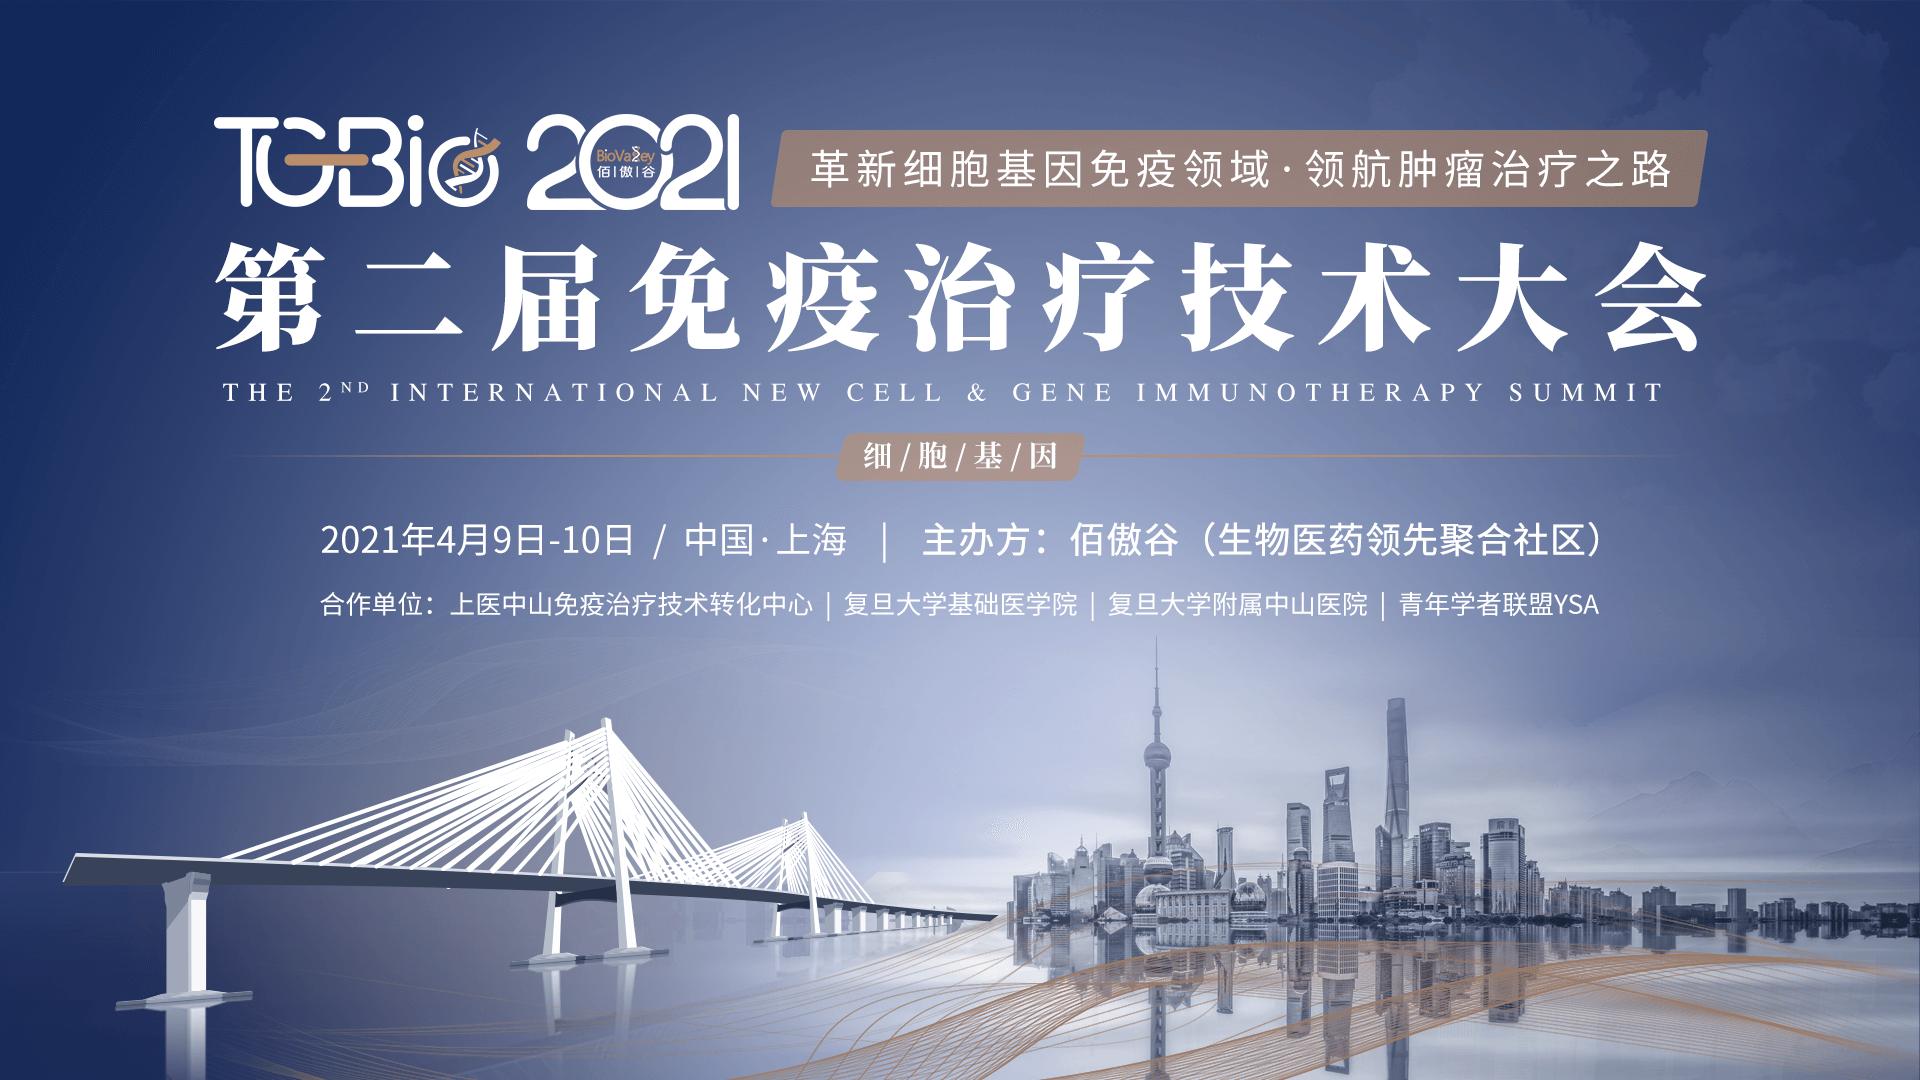 TG-Bio 2021年第二屆免疫治療技術大會